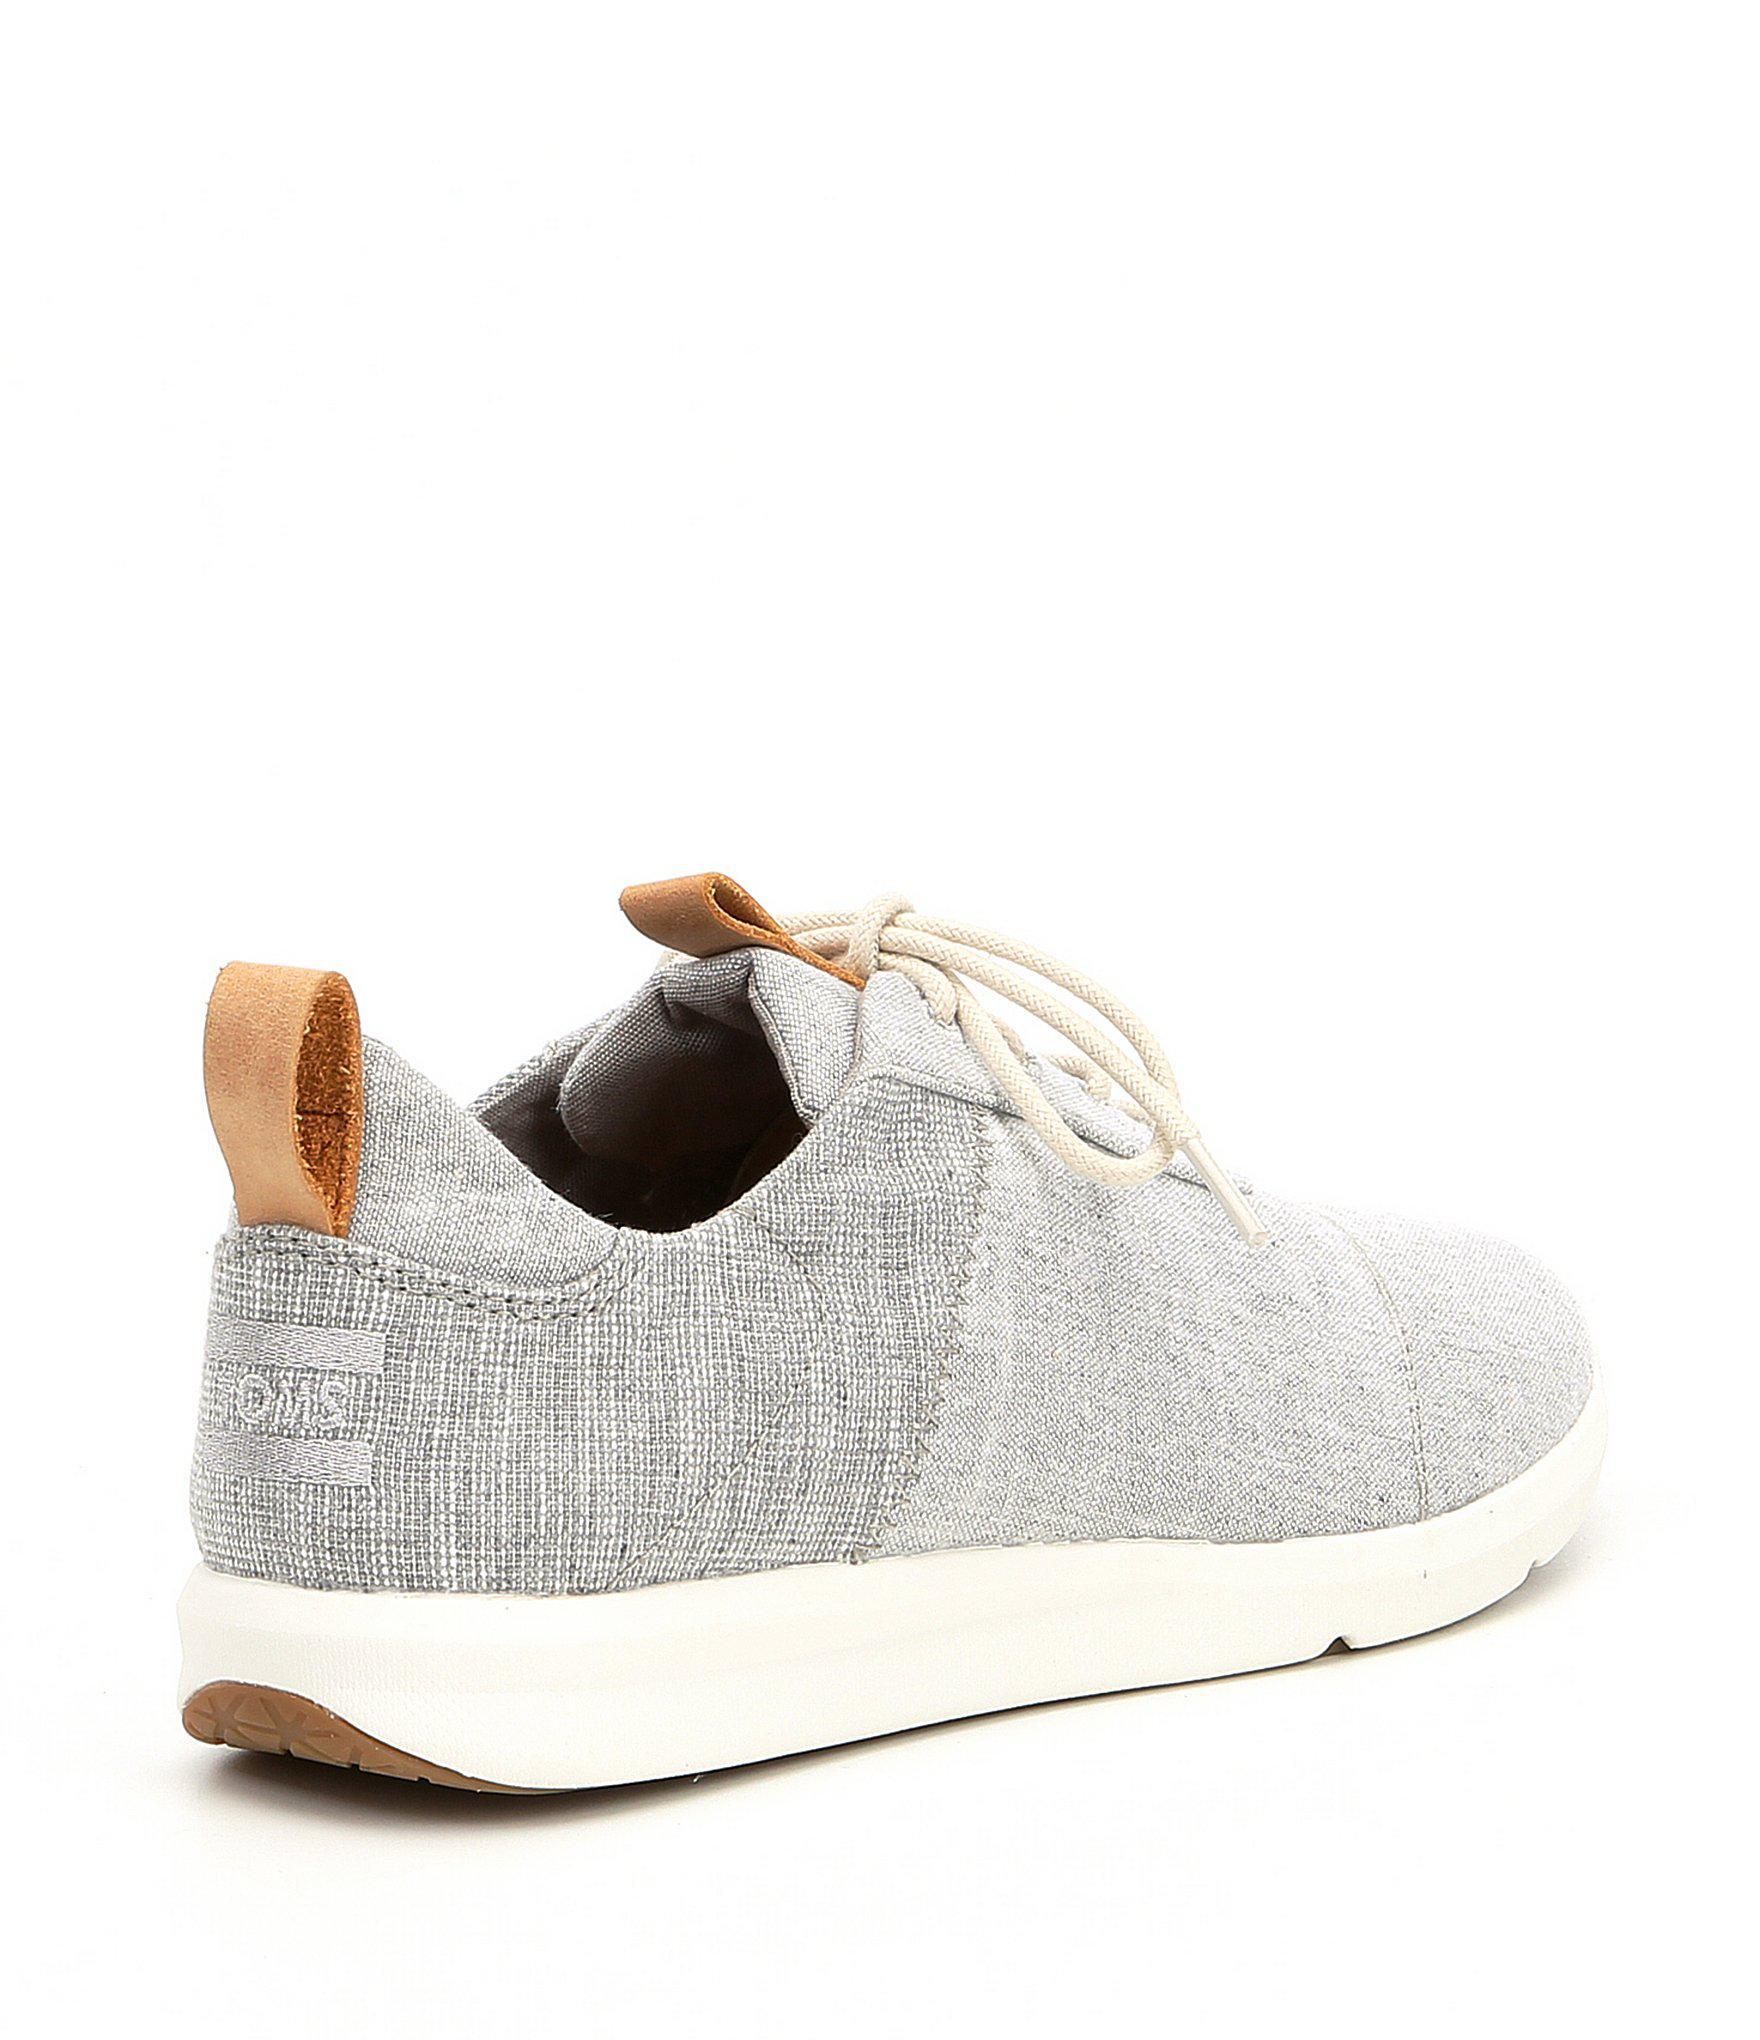 019394186e04 TOMS - Gray Women s Cabrillo Chambray Sneakers - Lyst. View fullscreen